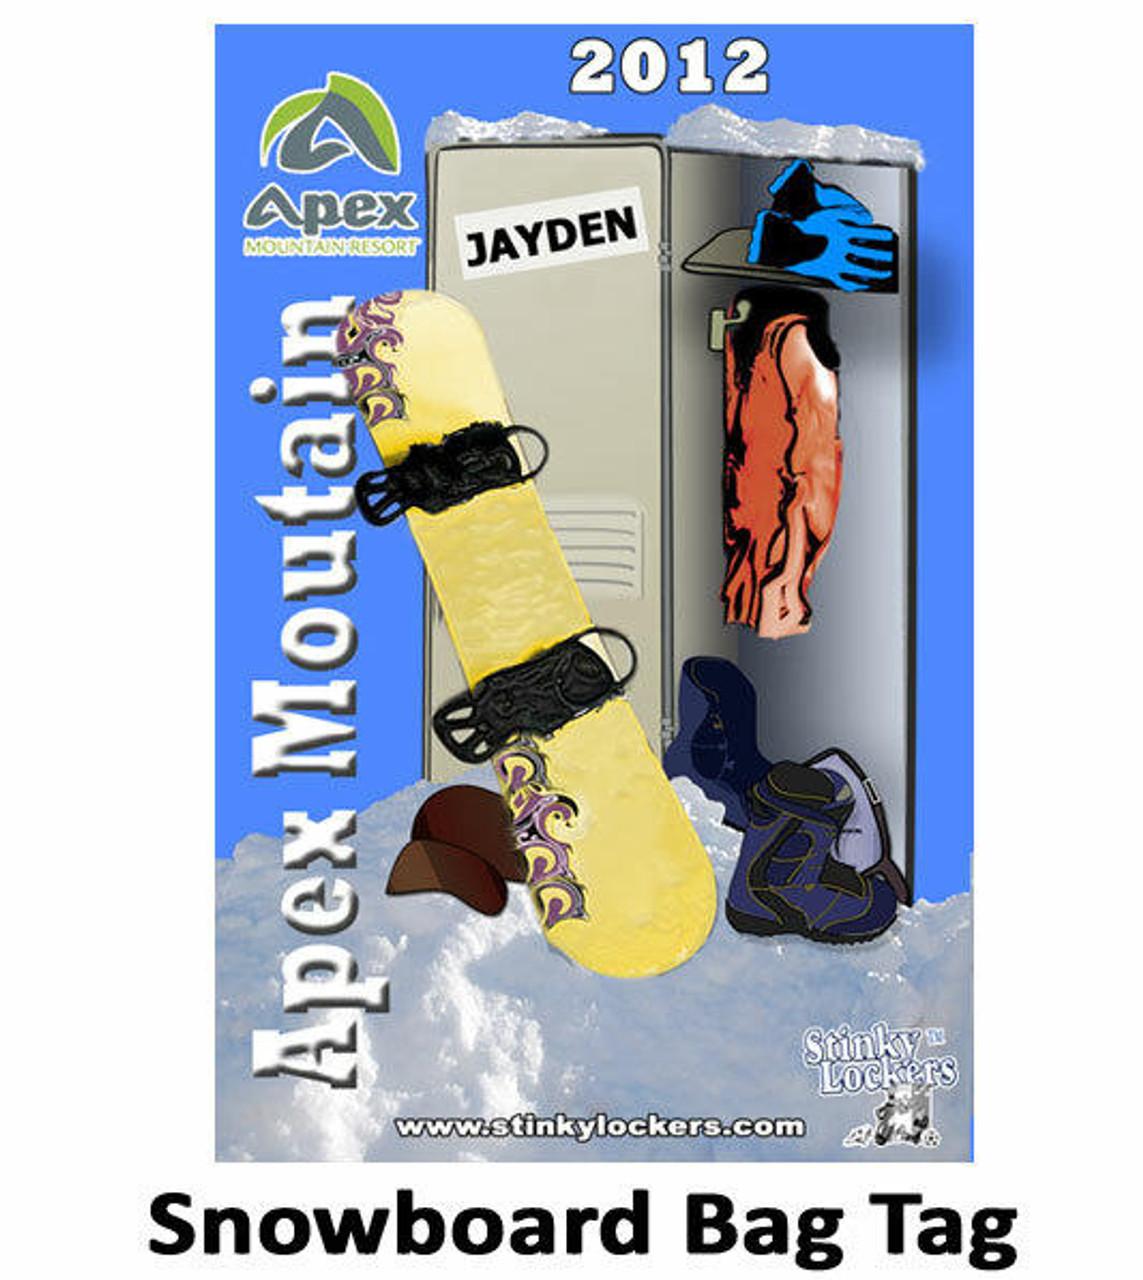 Snowboarding Bag Tag